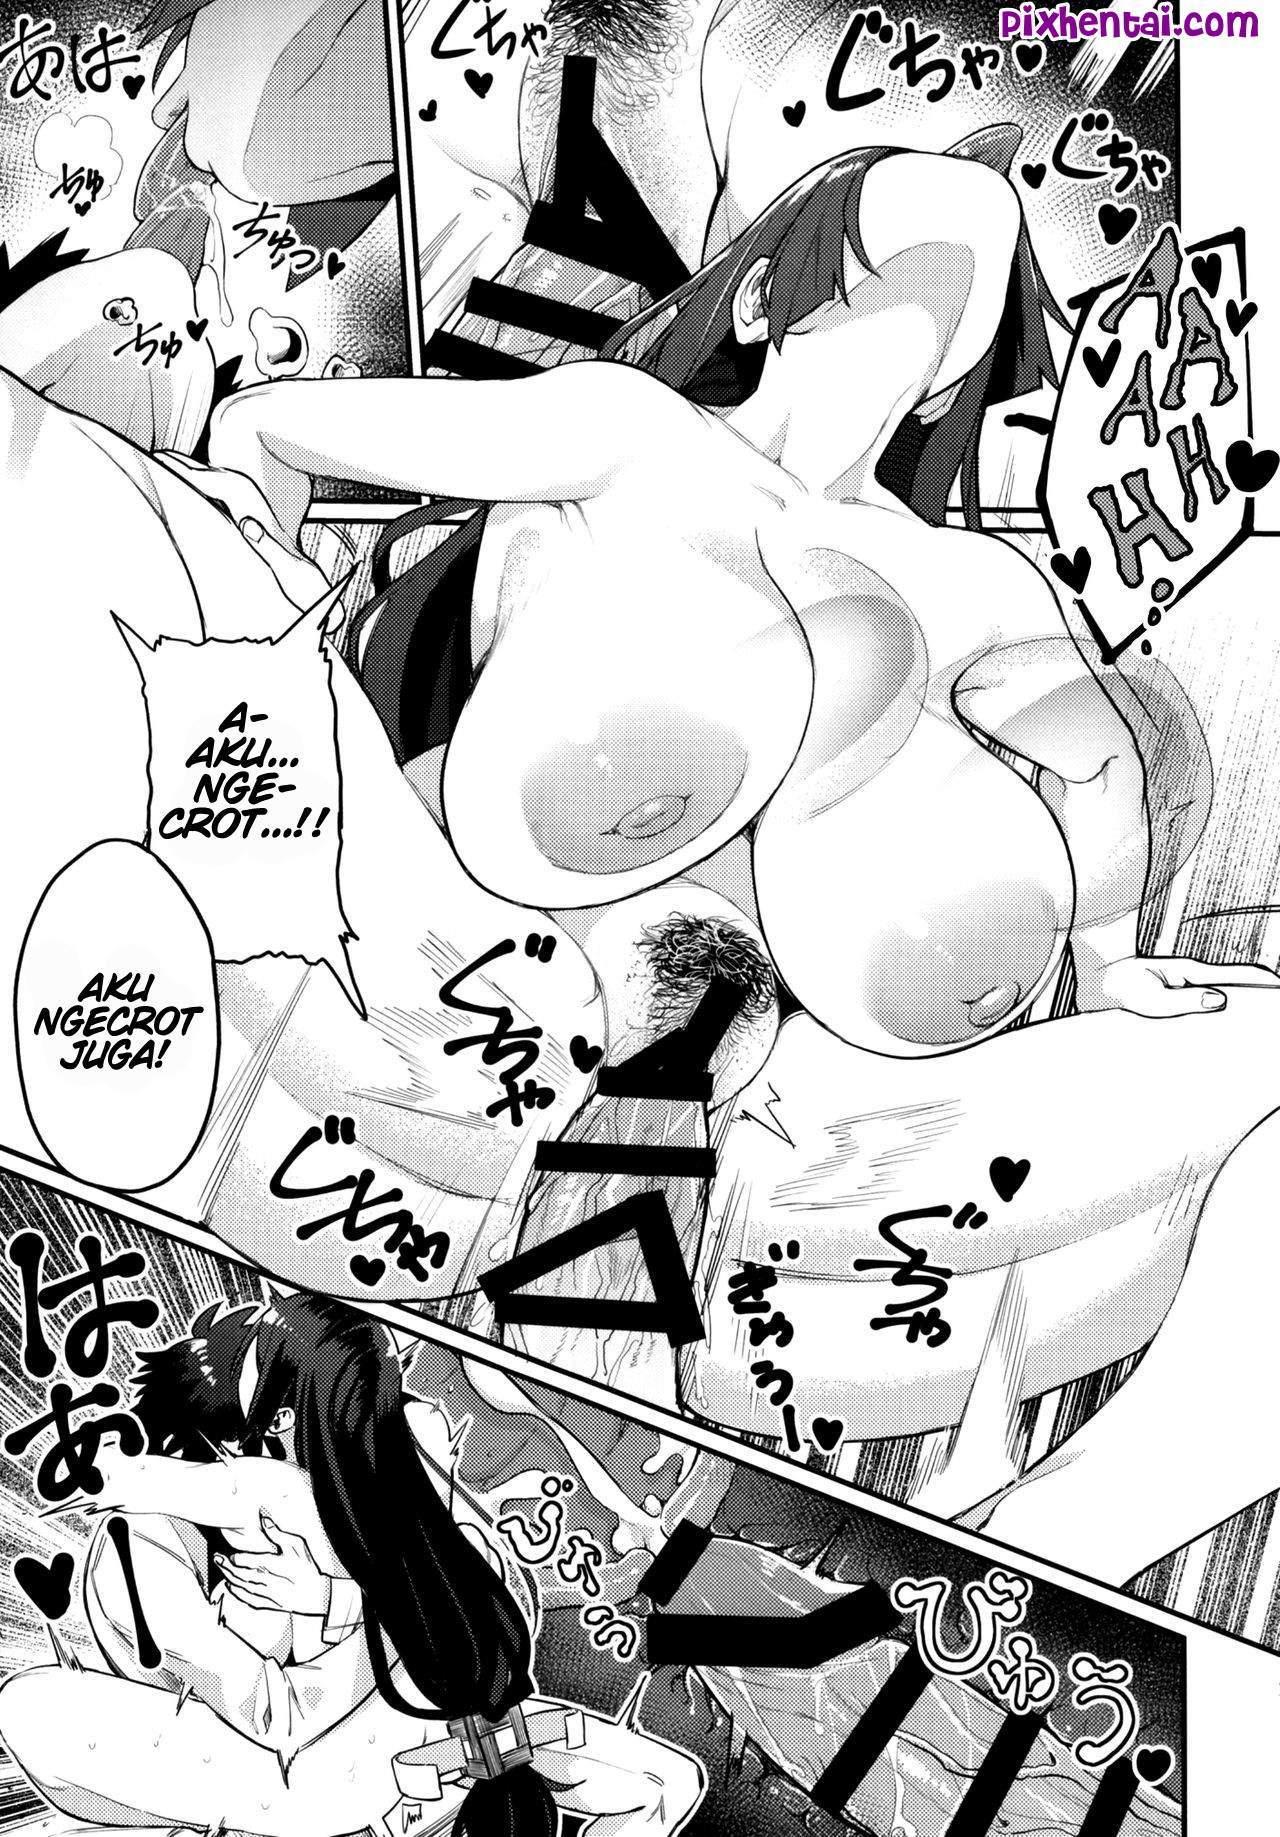 Komik Hentai Leave It To Mommy Raikou (Fate/Grand Order) Manga XXX Porn Doujin Sex Bokep 19